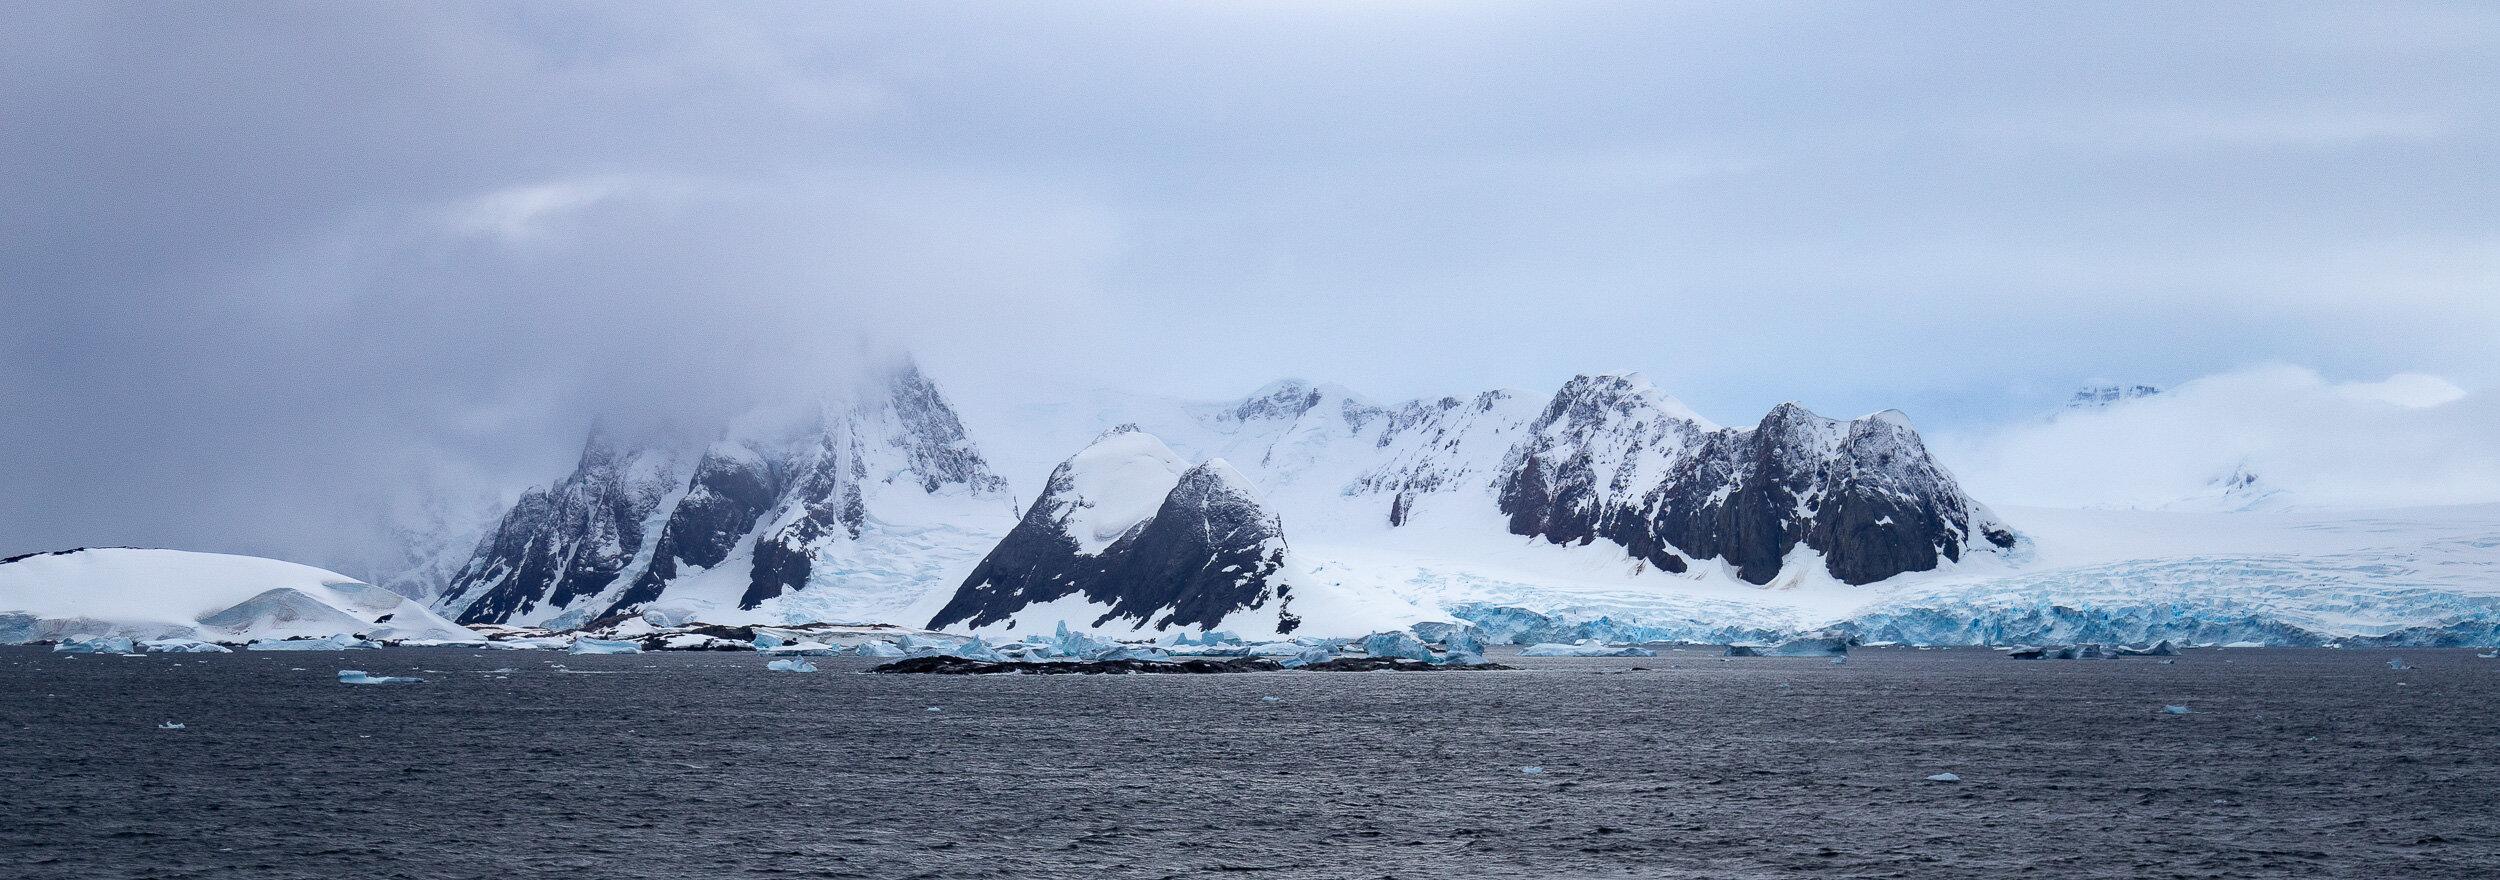 AmandaHiemstra-antarctica.jpg